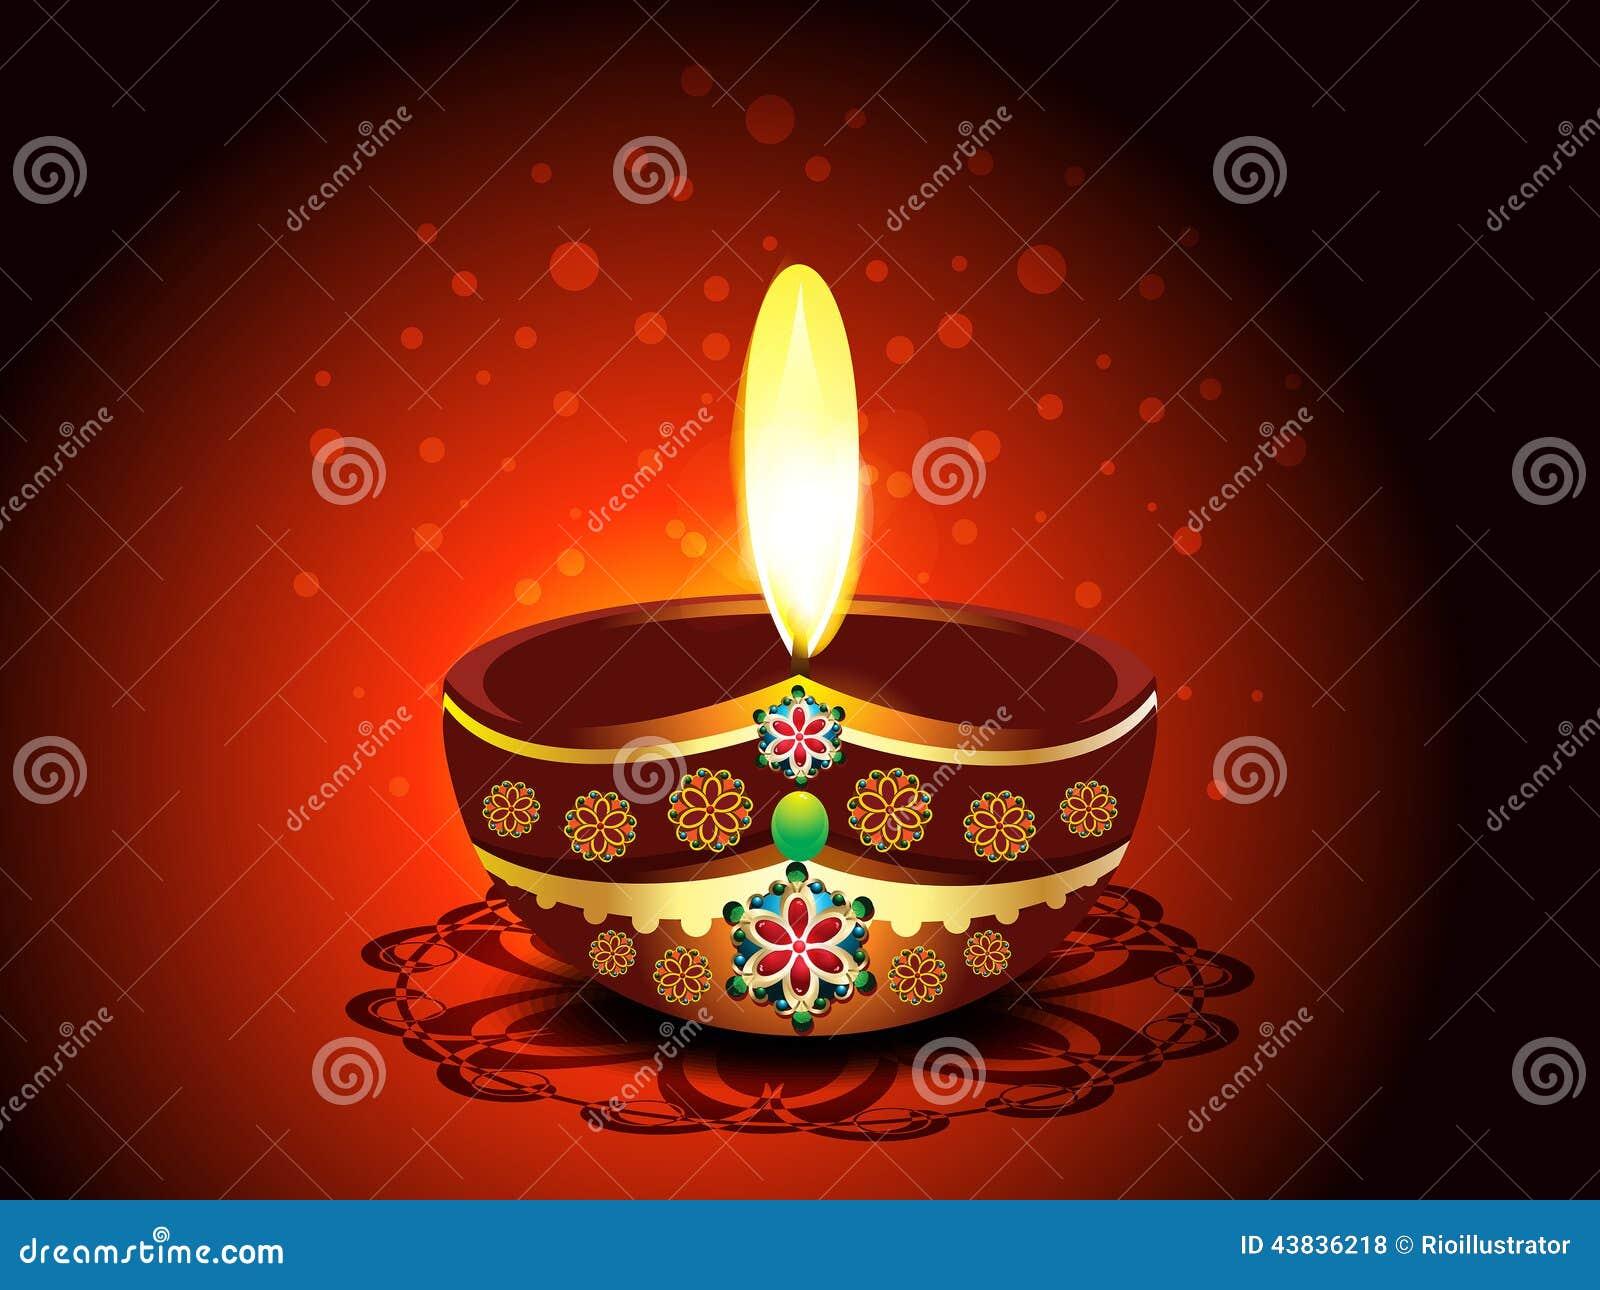 Diwali Deepak Background Stock Vector - Image: 43836218  Diwali Deepak B...